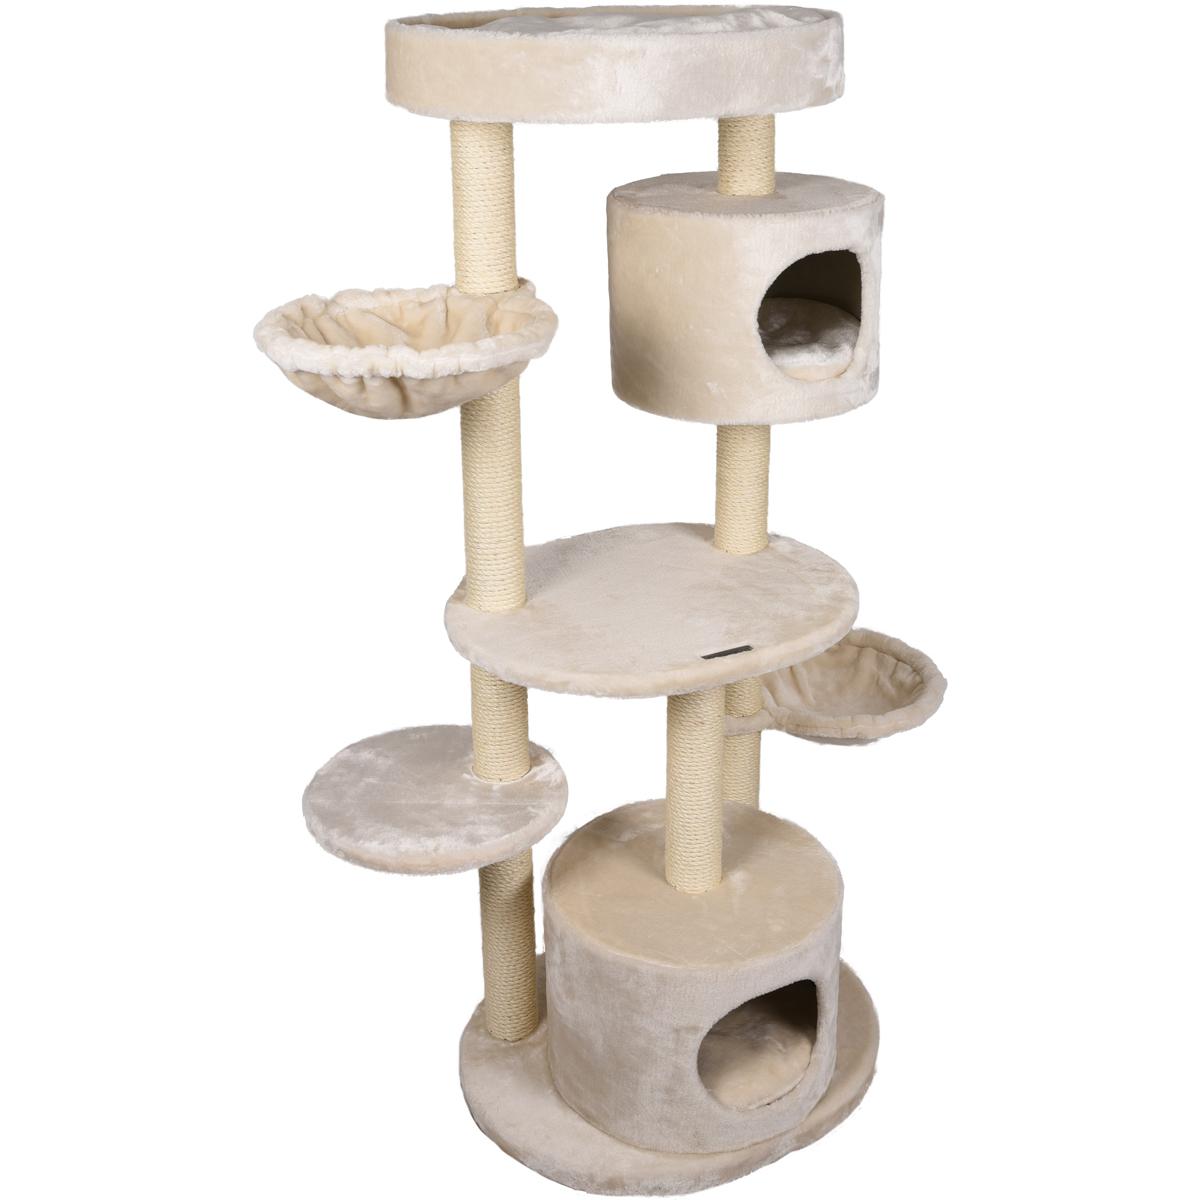 Krabpaal-Inga-Beige-103-x-50-x-142-cm-Flamingo